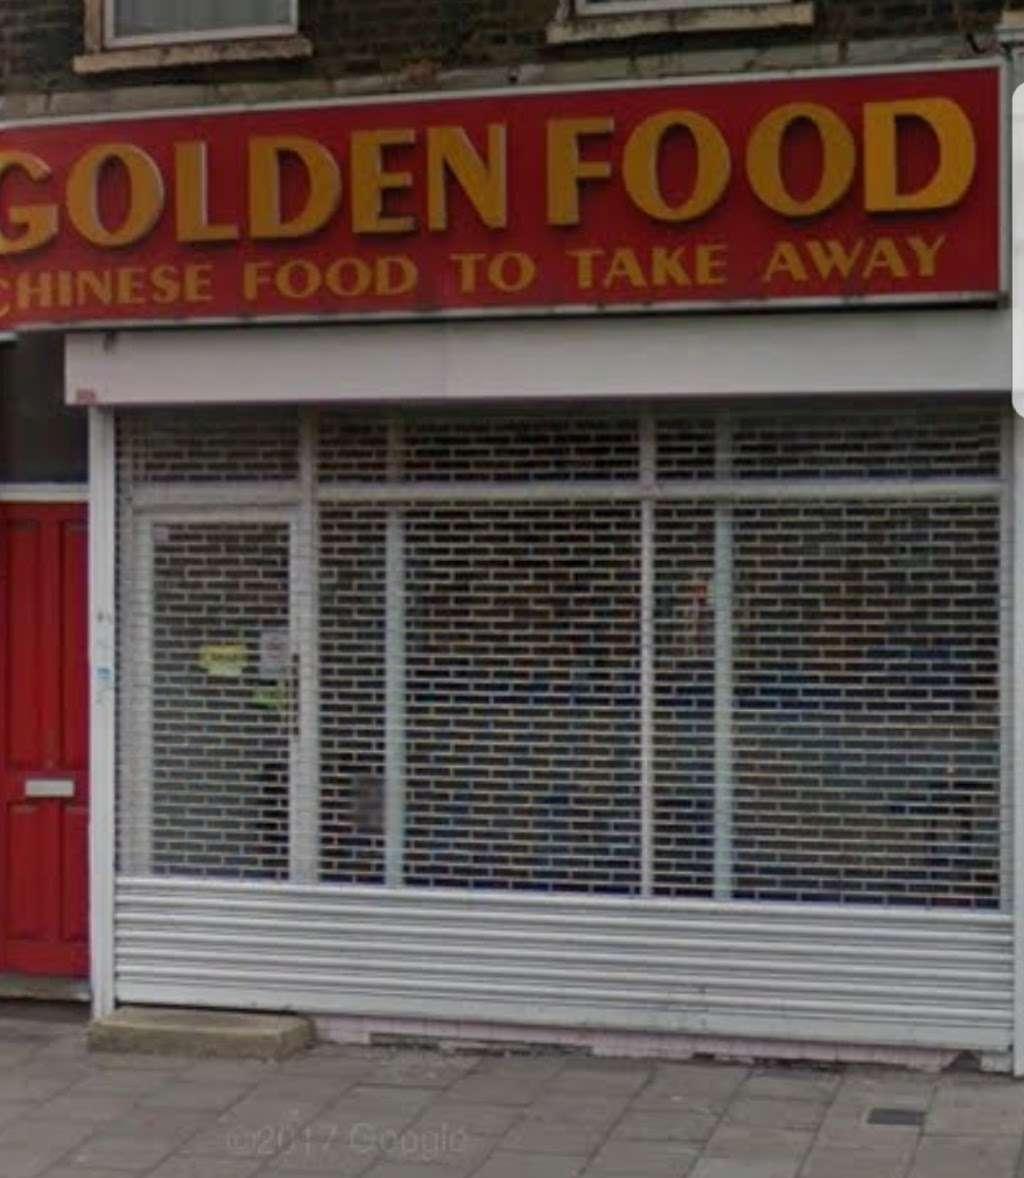 Golden Food Chinese Takeaway - meal takeaway    Photo 3 of 3   Address: 368 Kingsland Rd, London E8 4DA, UK   Phone: 020 7249 0942